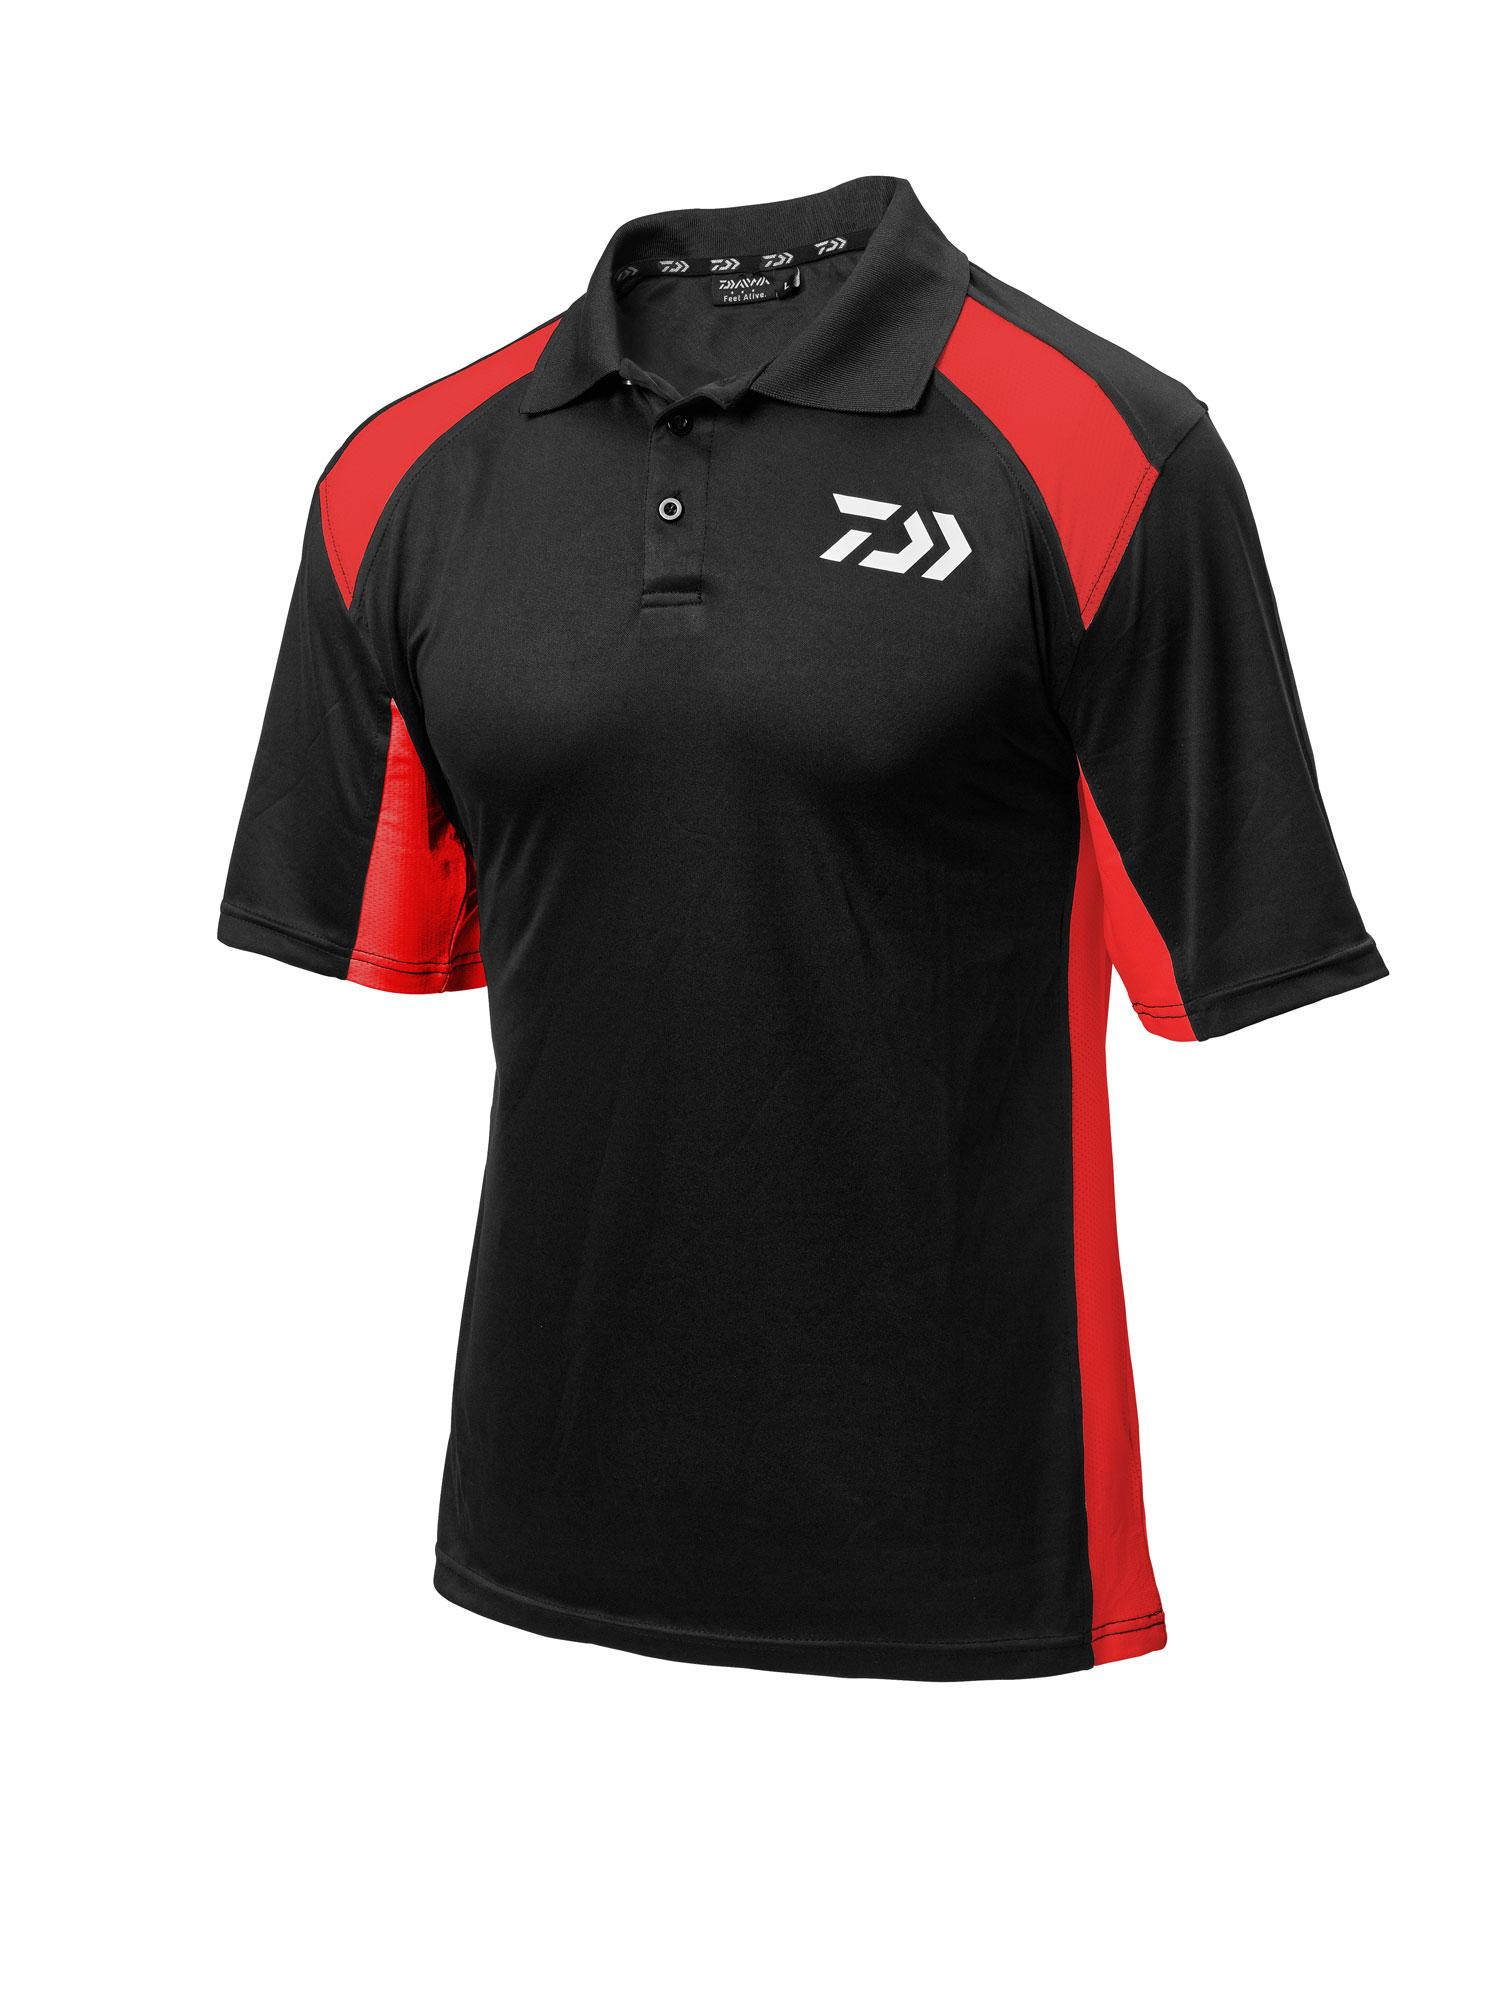 New Polo Shirts Rldm